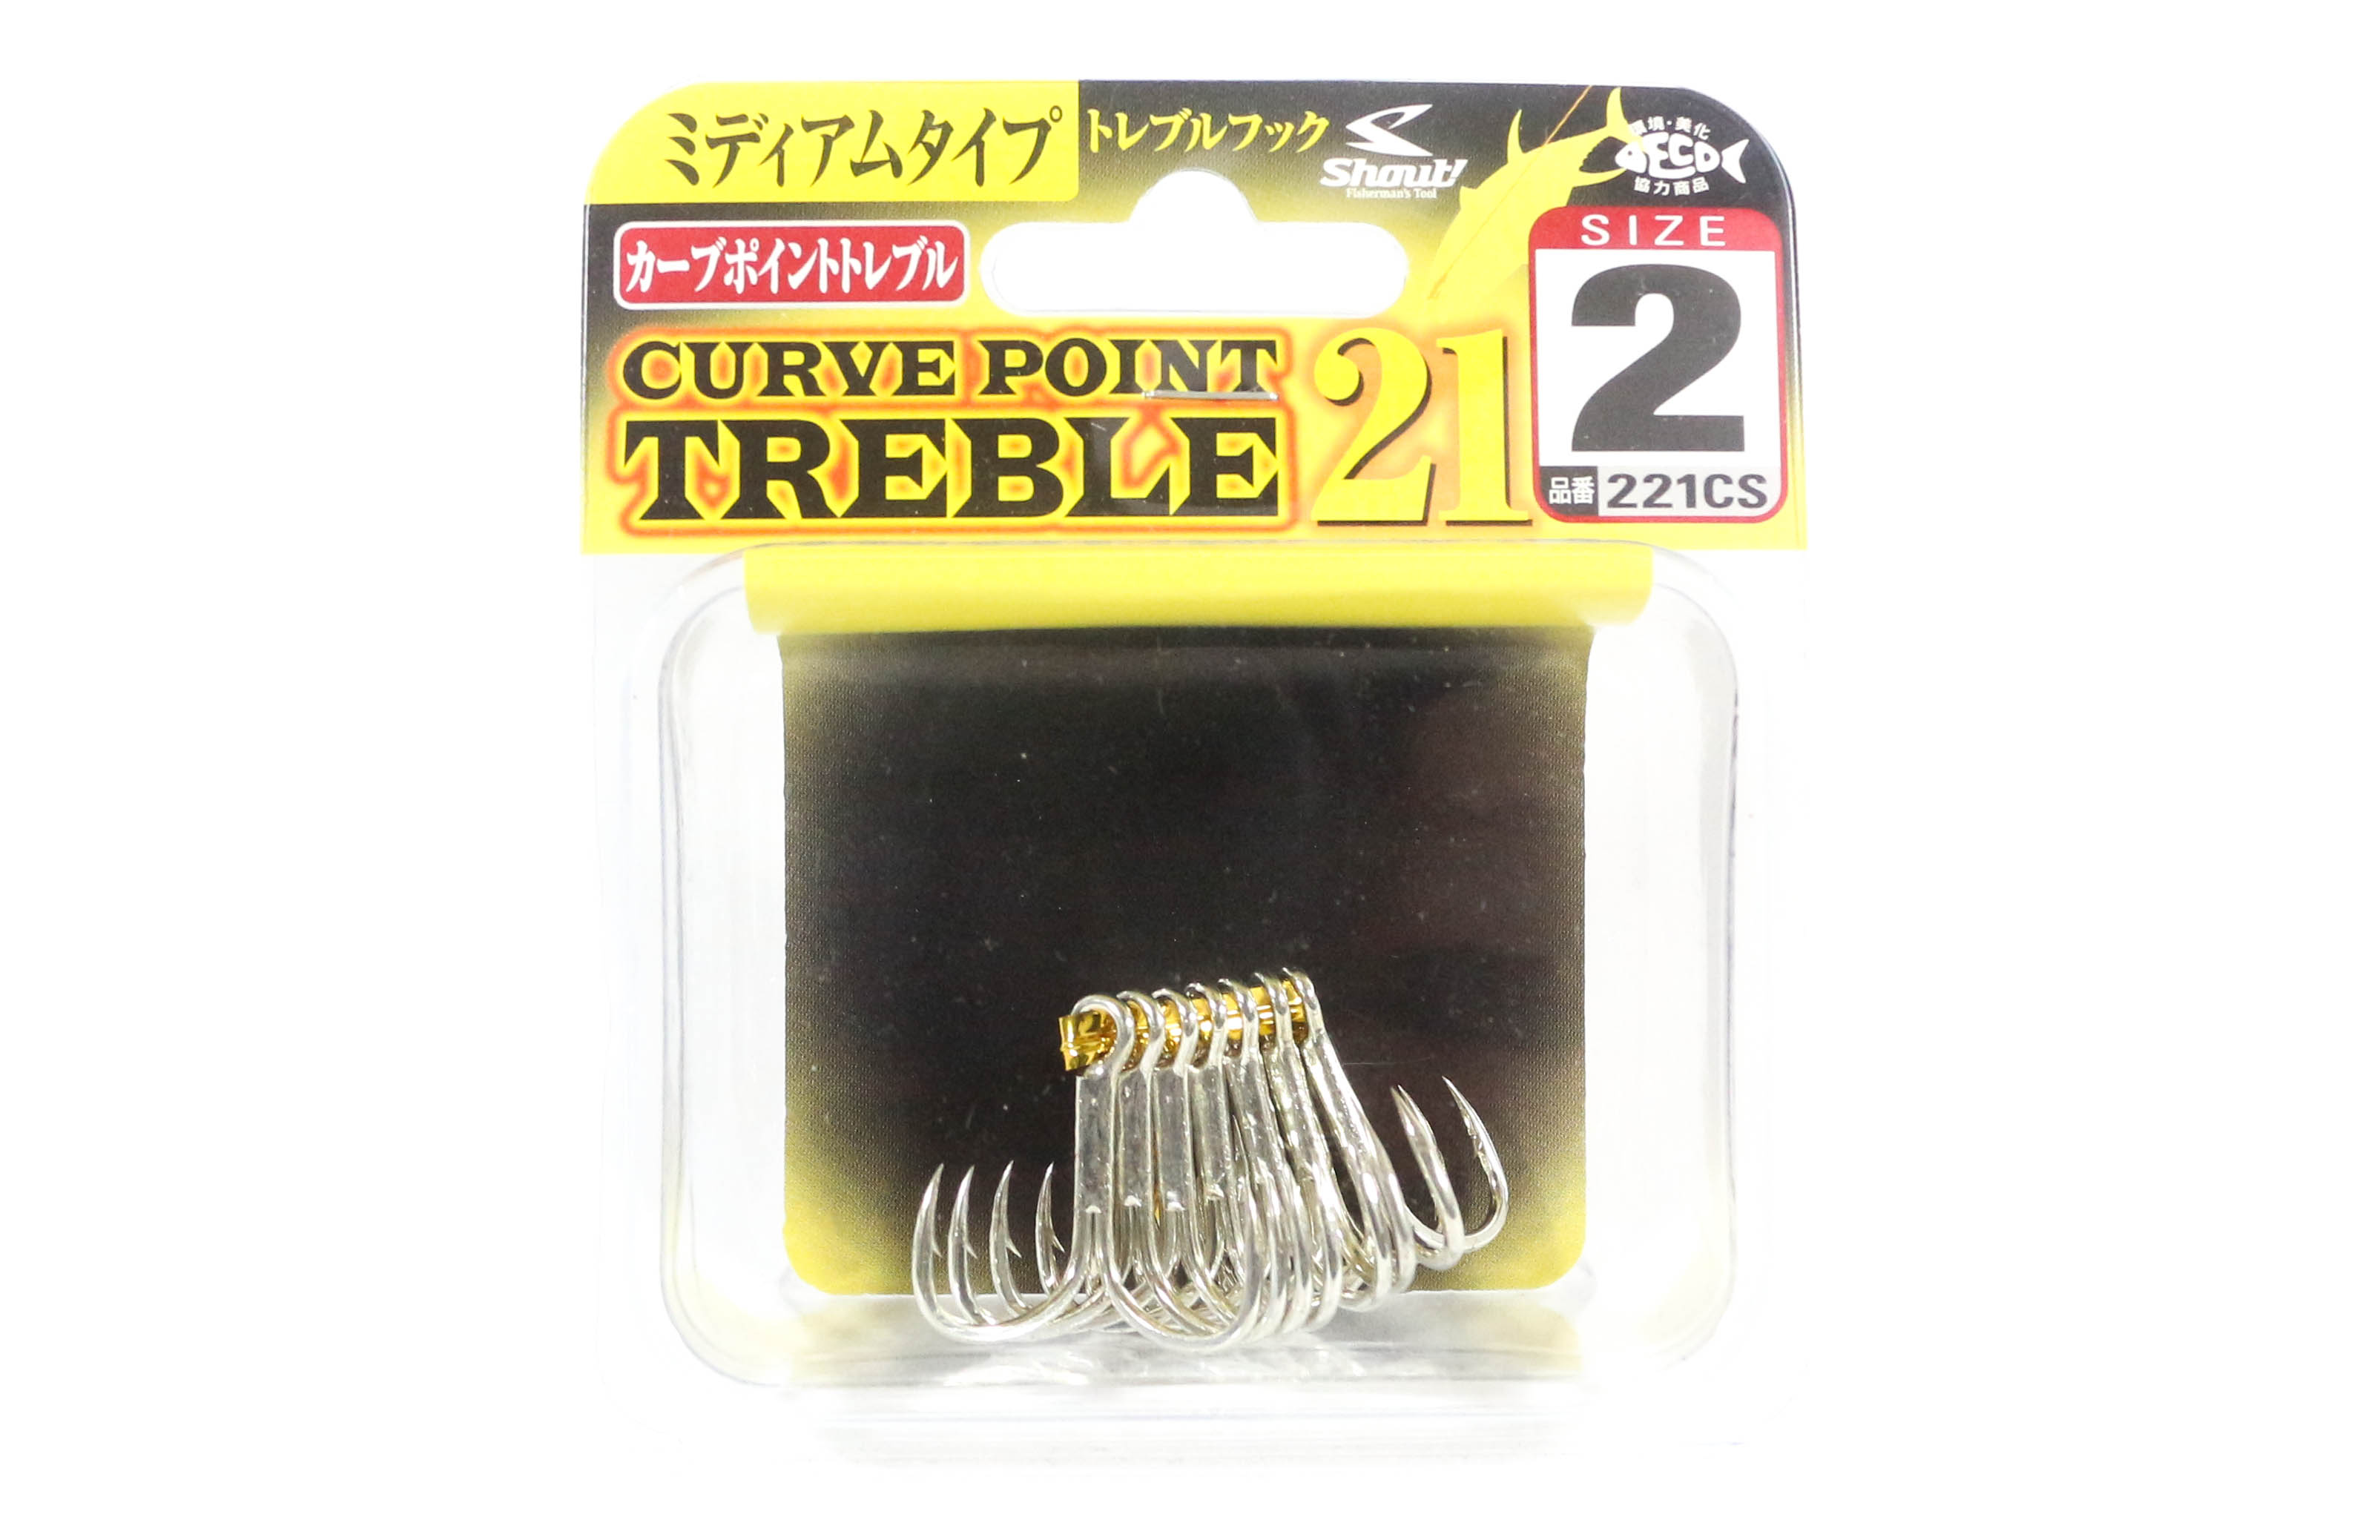 Shout 221-CS Curve Point Treble Hook Medium Gauge Size 2 (9654)